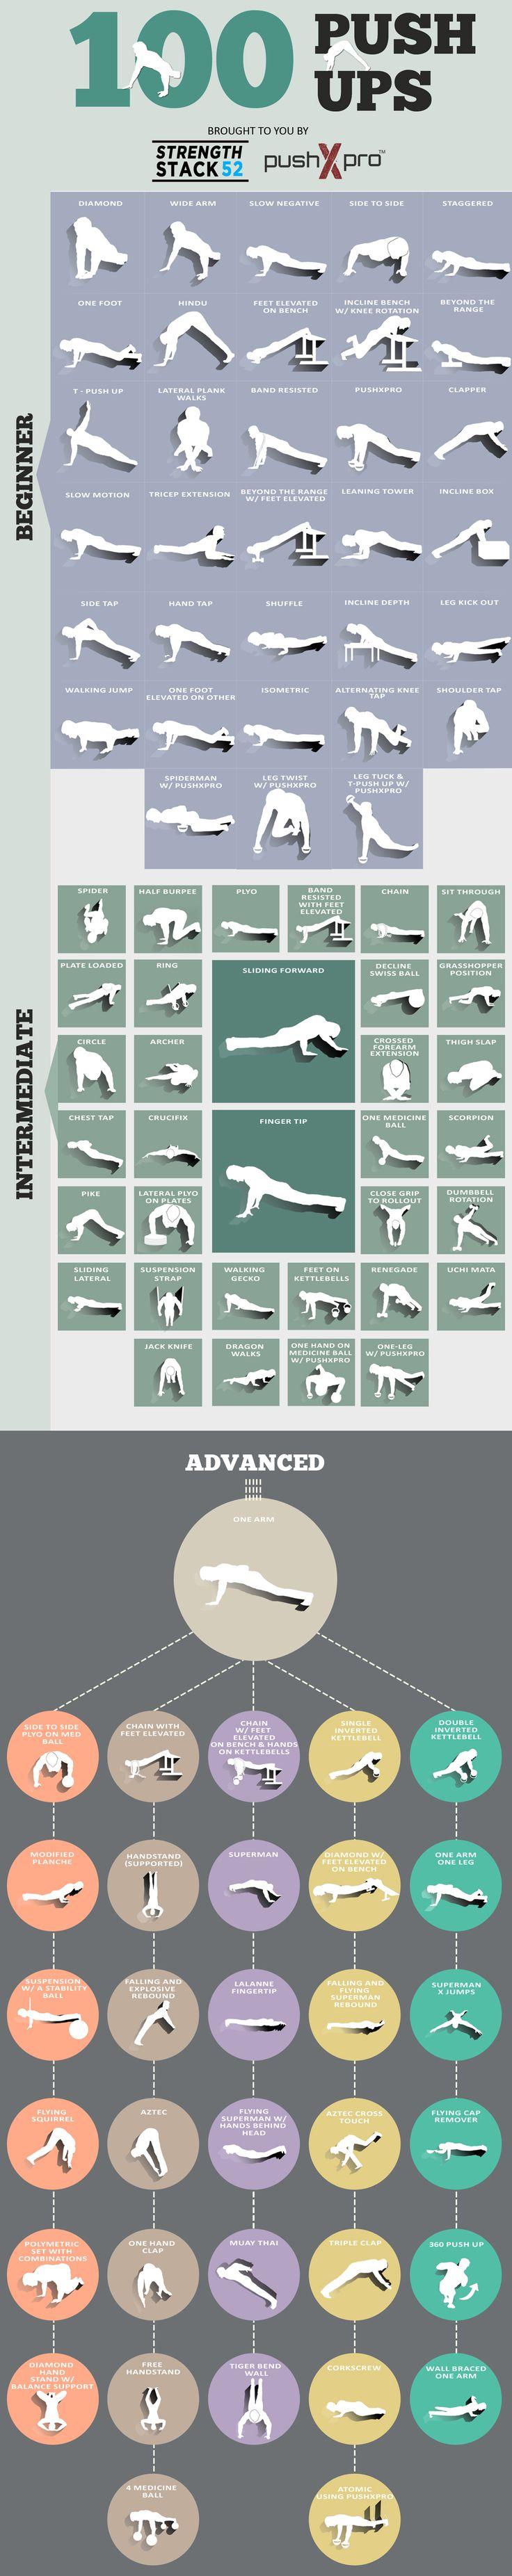 push-up-variations